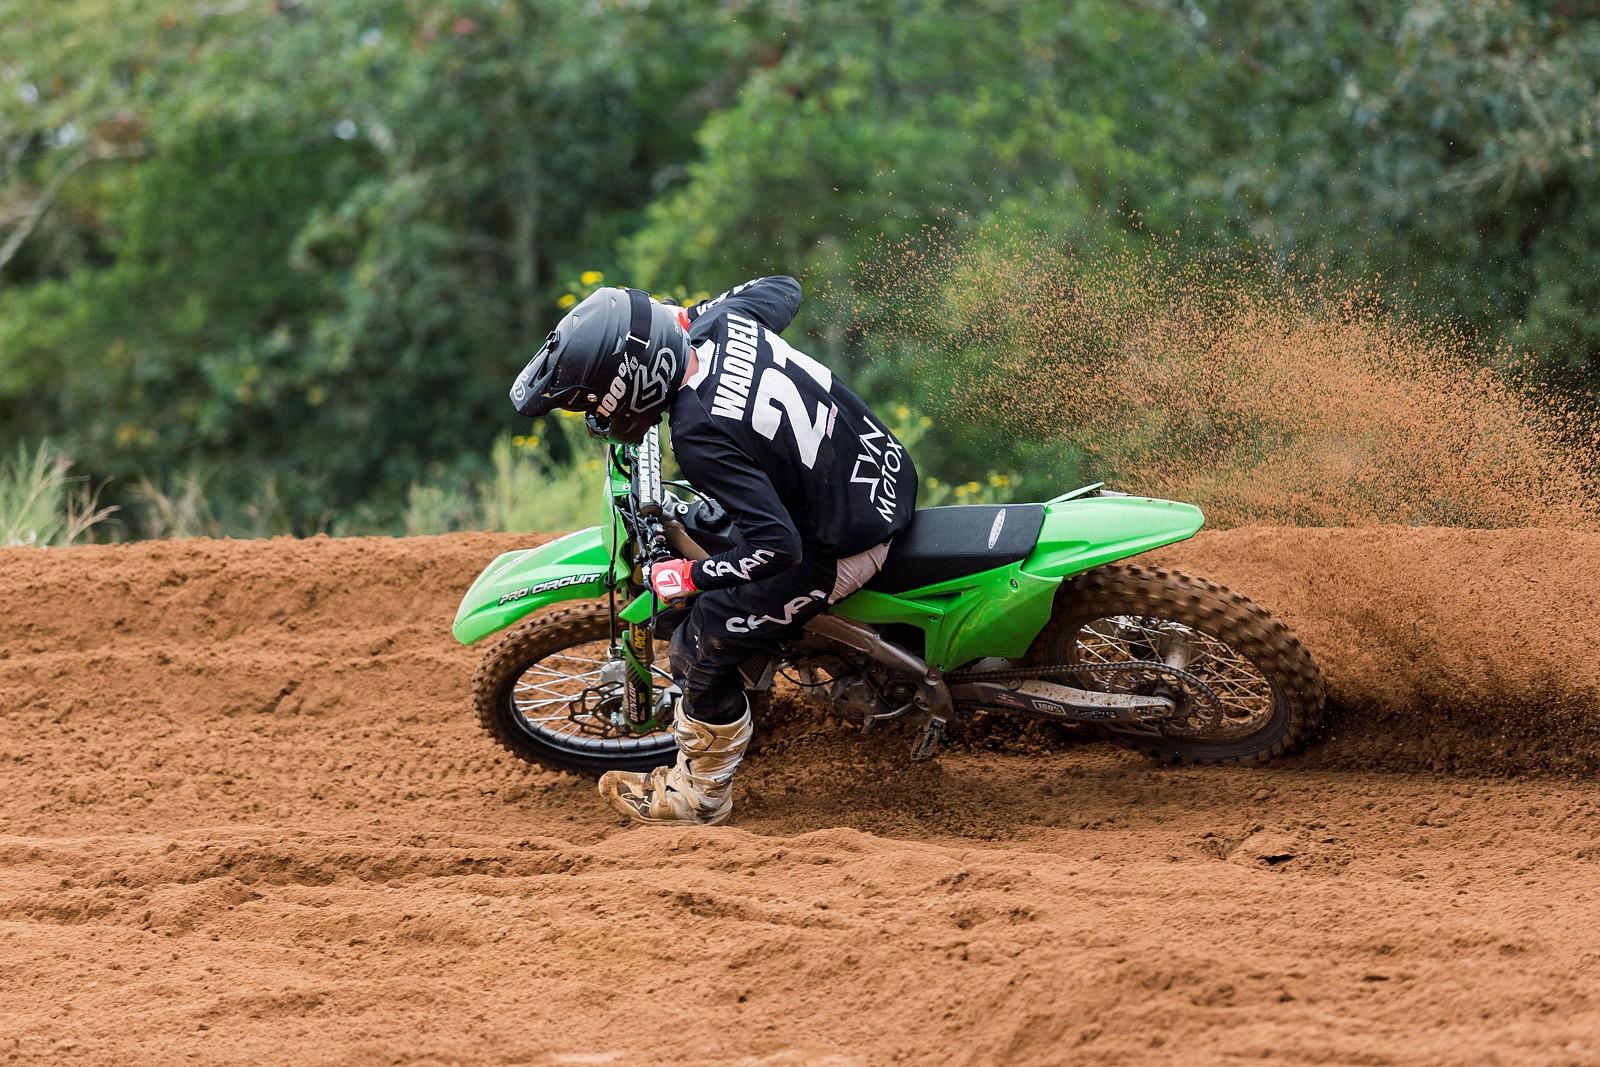 AB449D77-D7C9-4280-BEF7-9AD4F6745C86 - Reid Waddell - Motocross Pictures - Vital MX